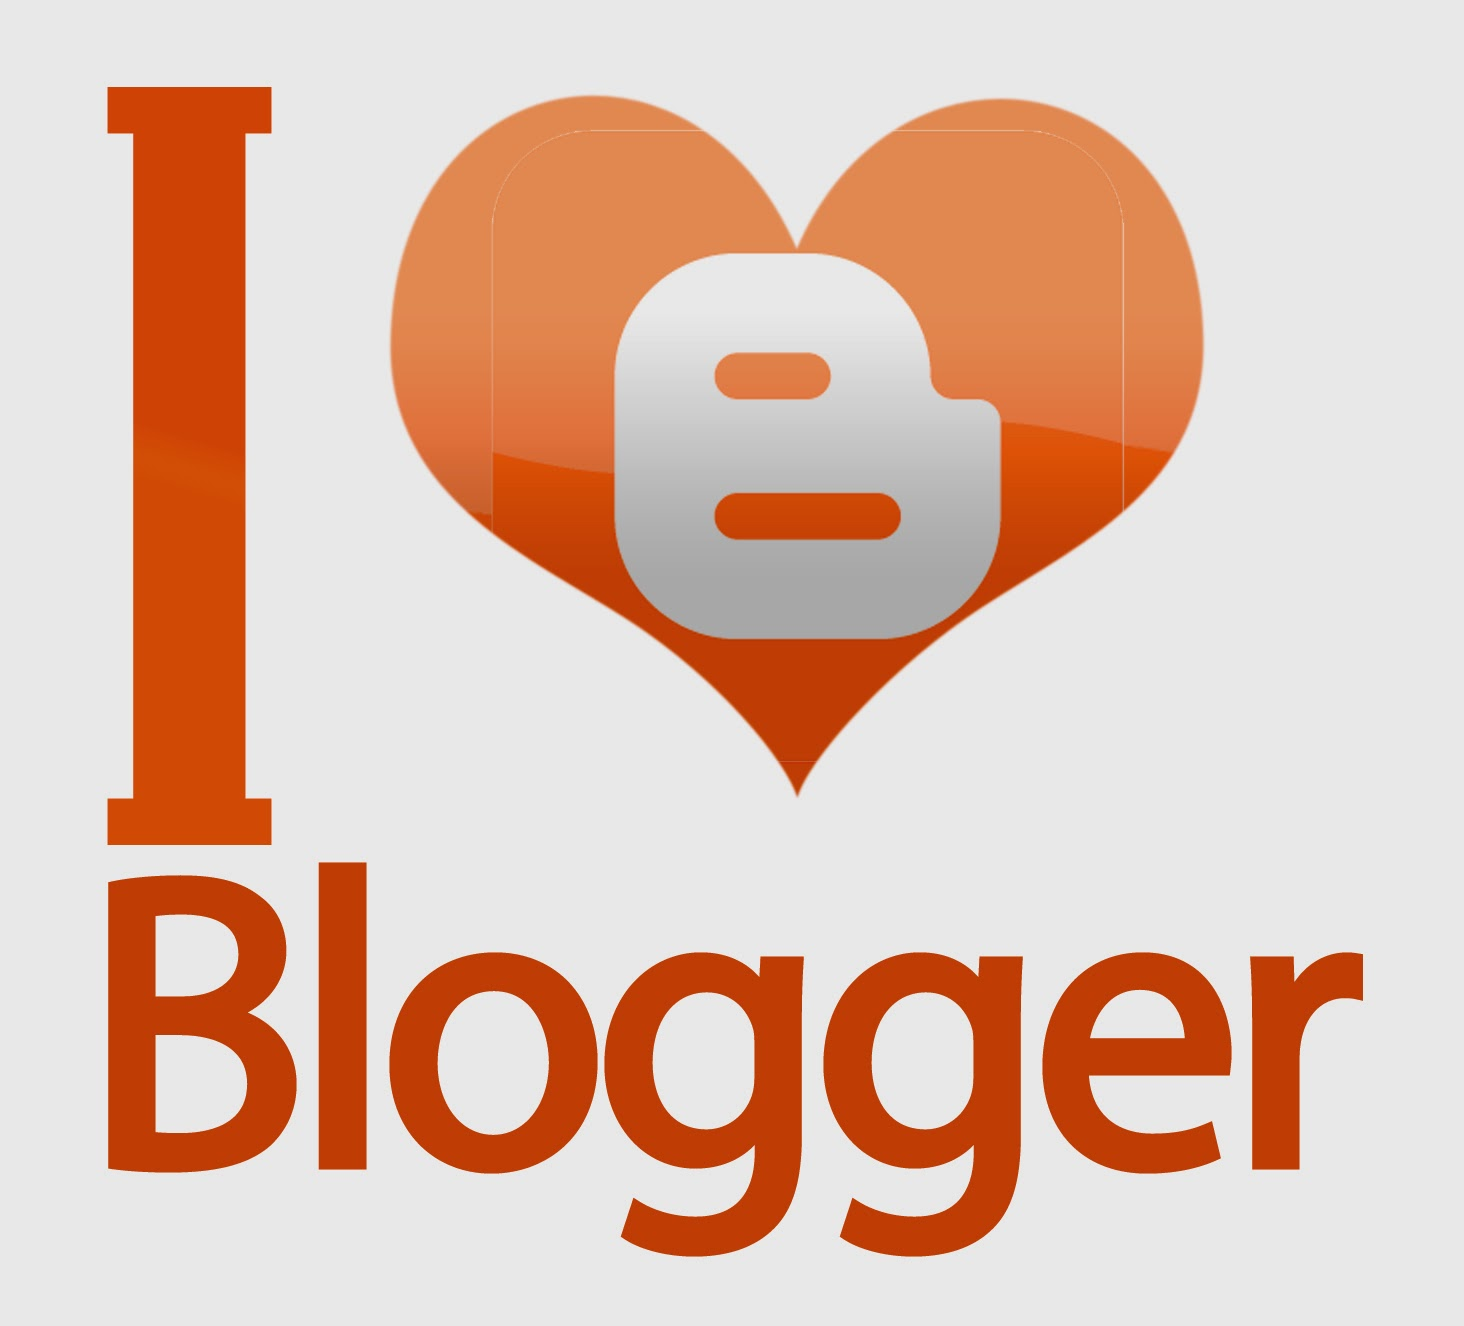 I love blogger